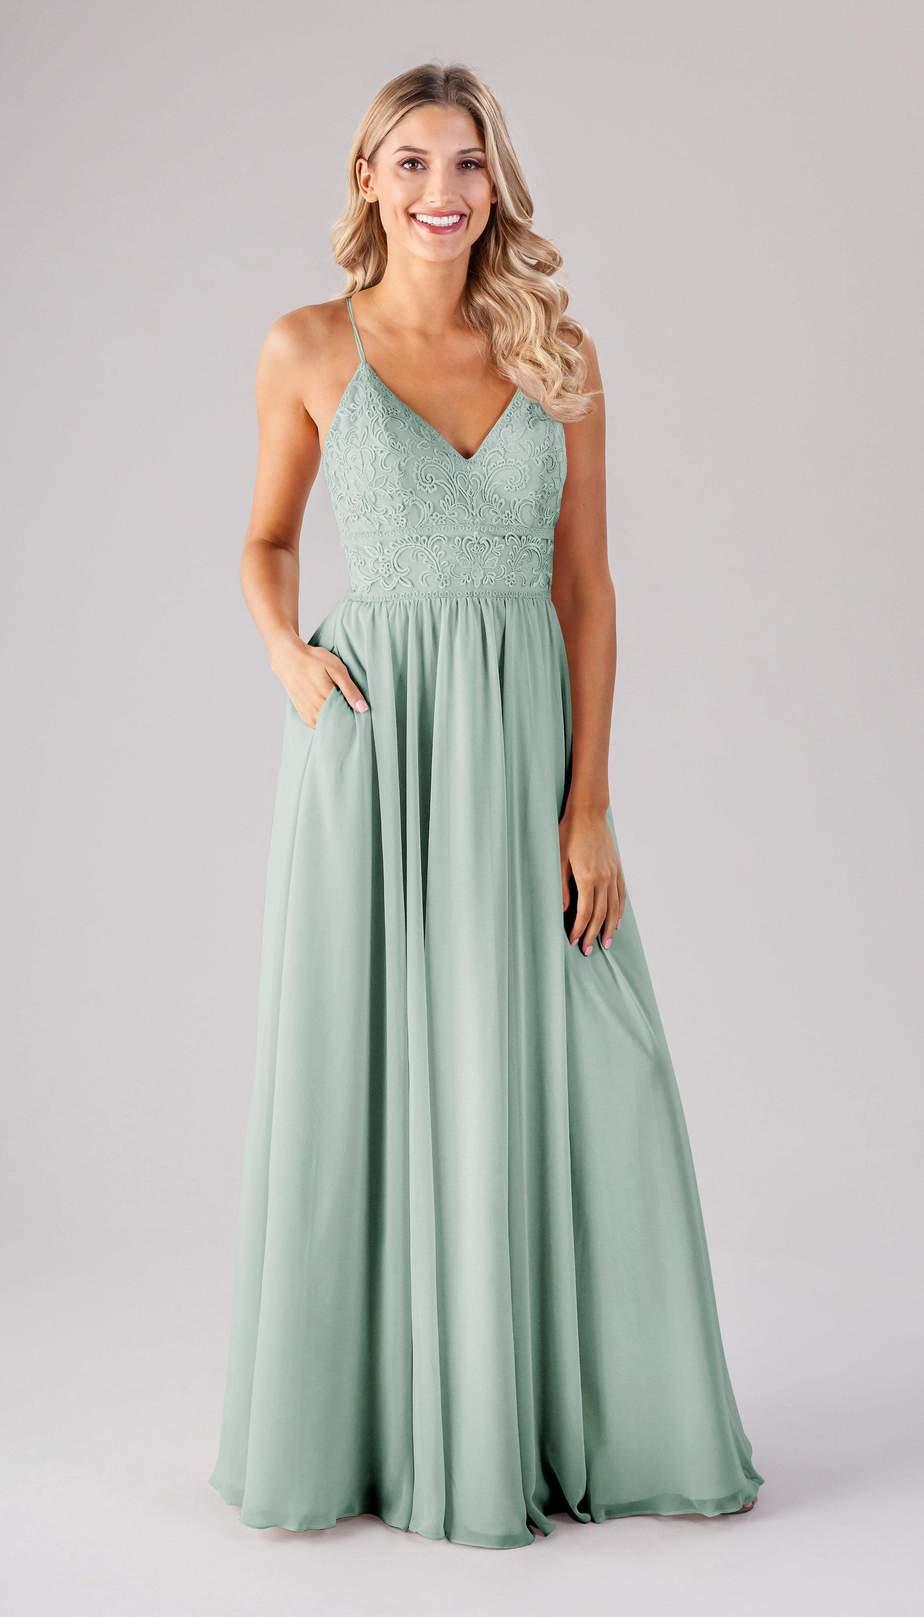 sea glass green long bridesmaid dress